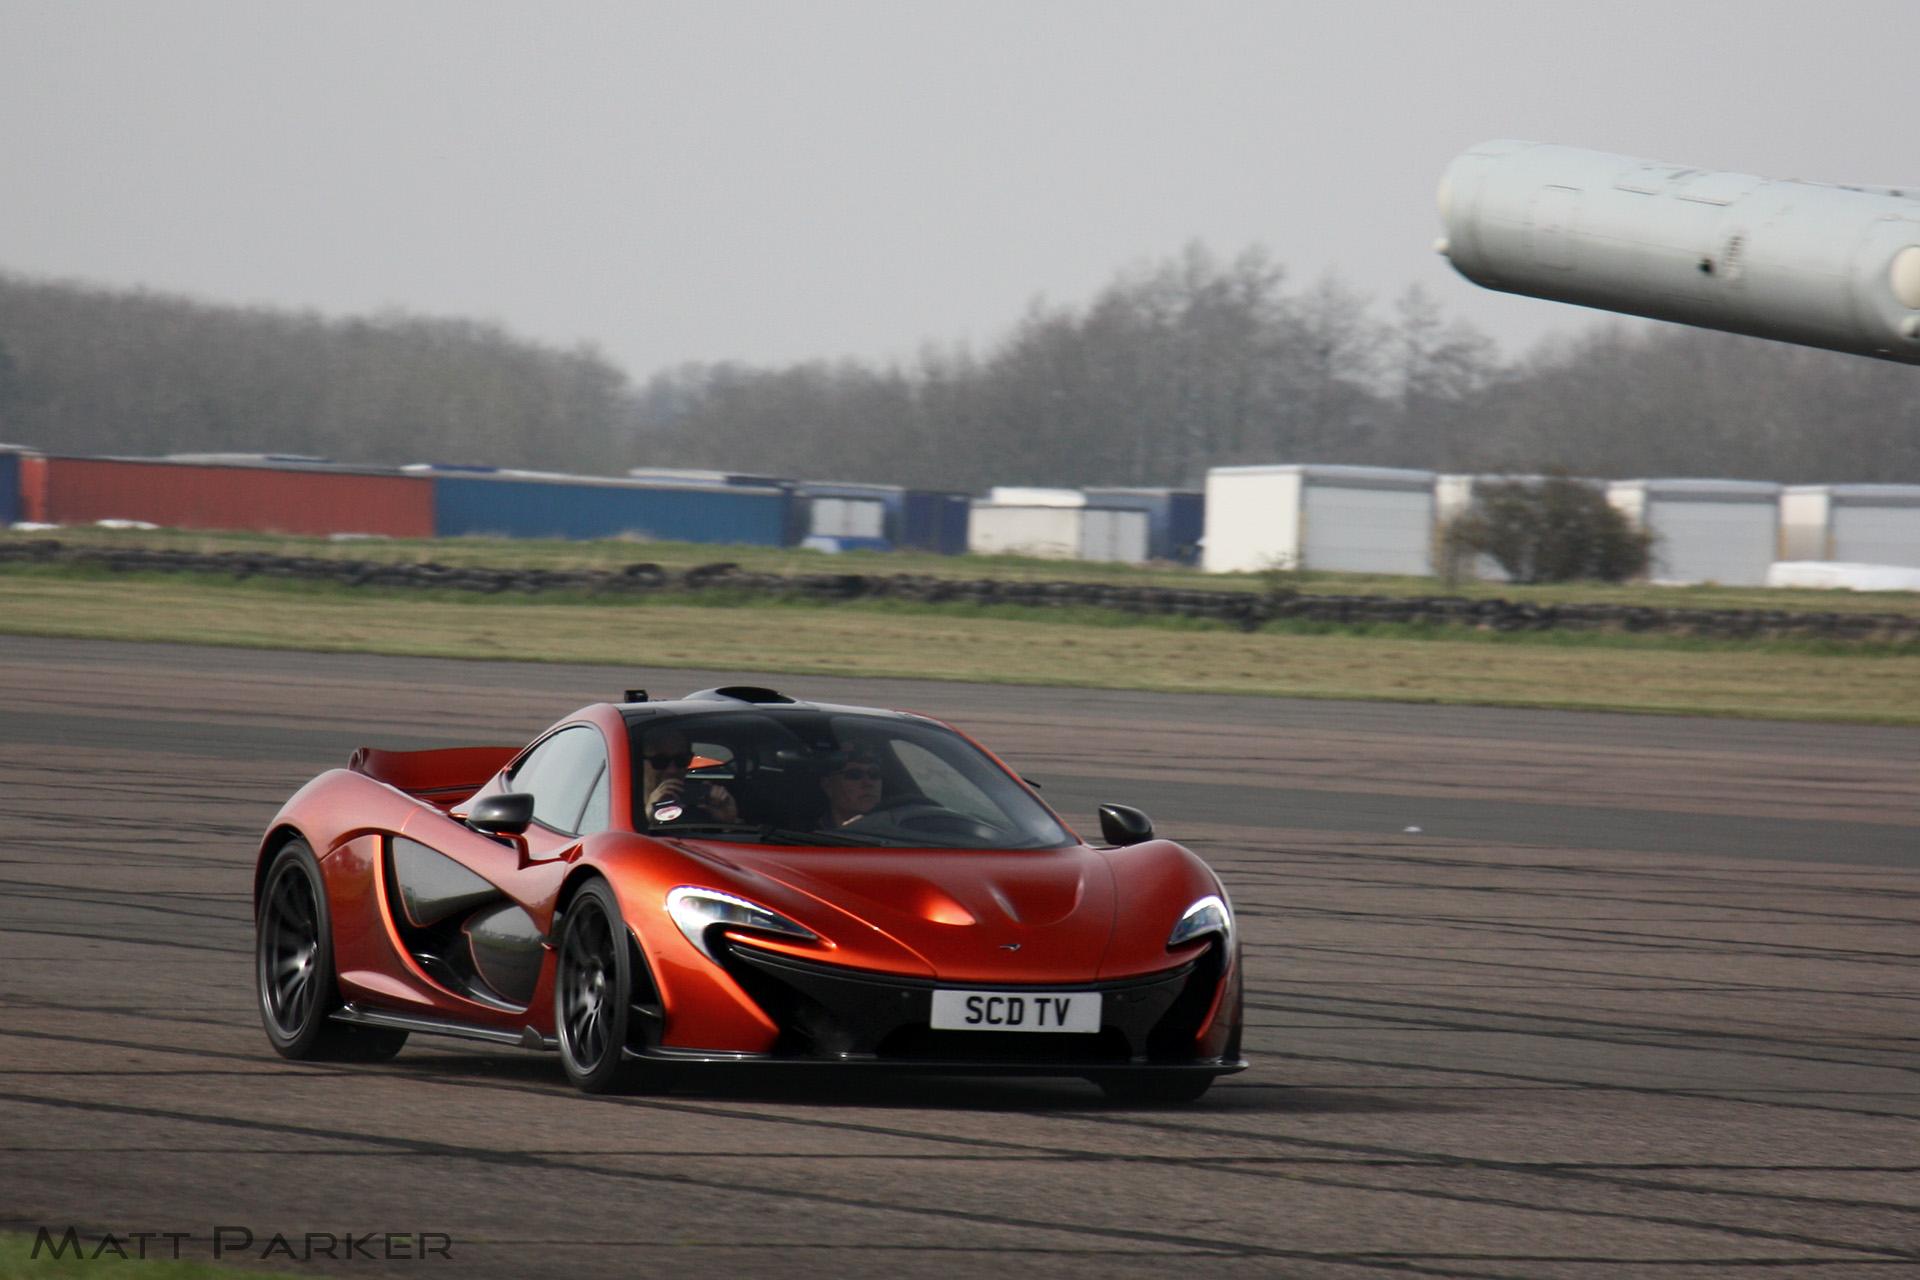 orange paul volcano secret McLaren bailey Driver Hybrid runway meet supercar p1 scd bruntingthorpe Hypercar 984373